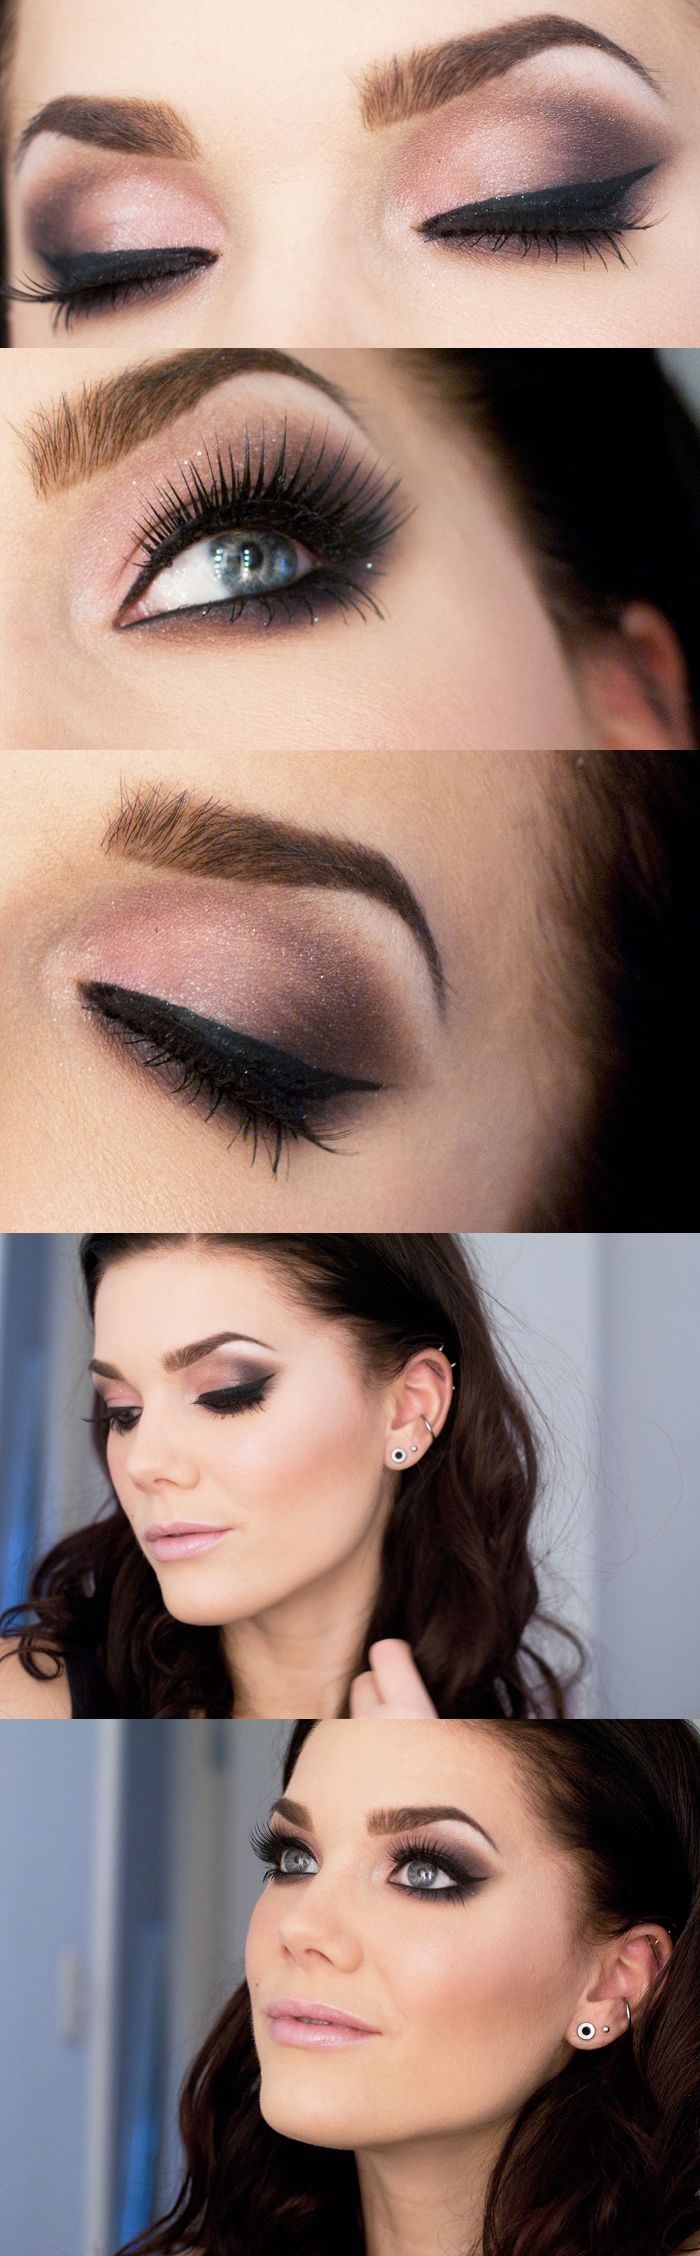 Today's Look - Earth Invasion  Linda Hallberg - makeup artist